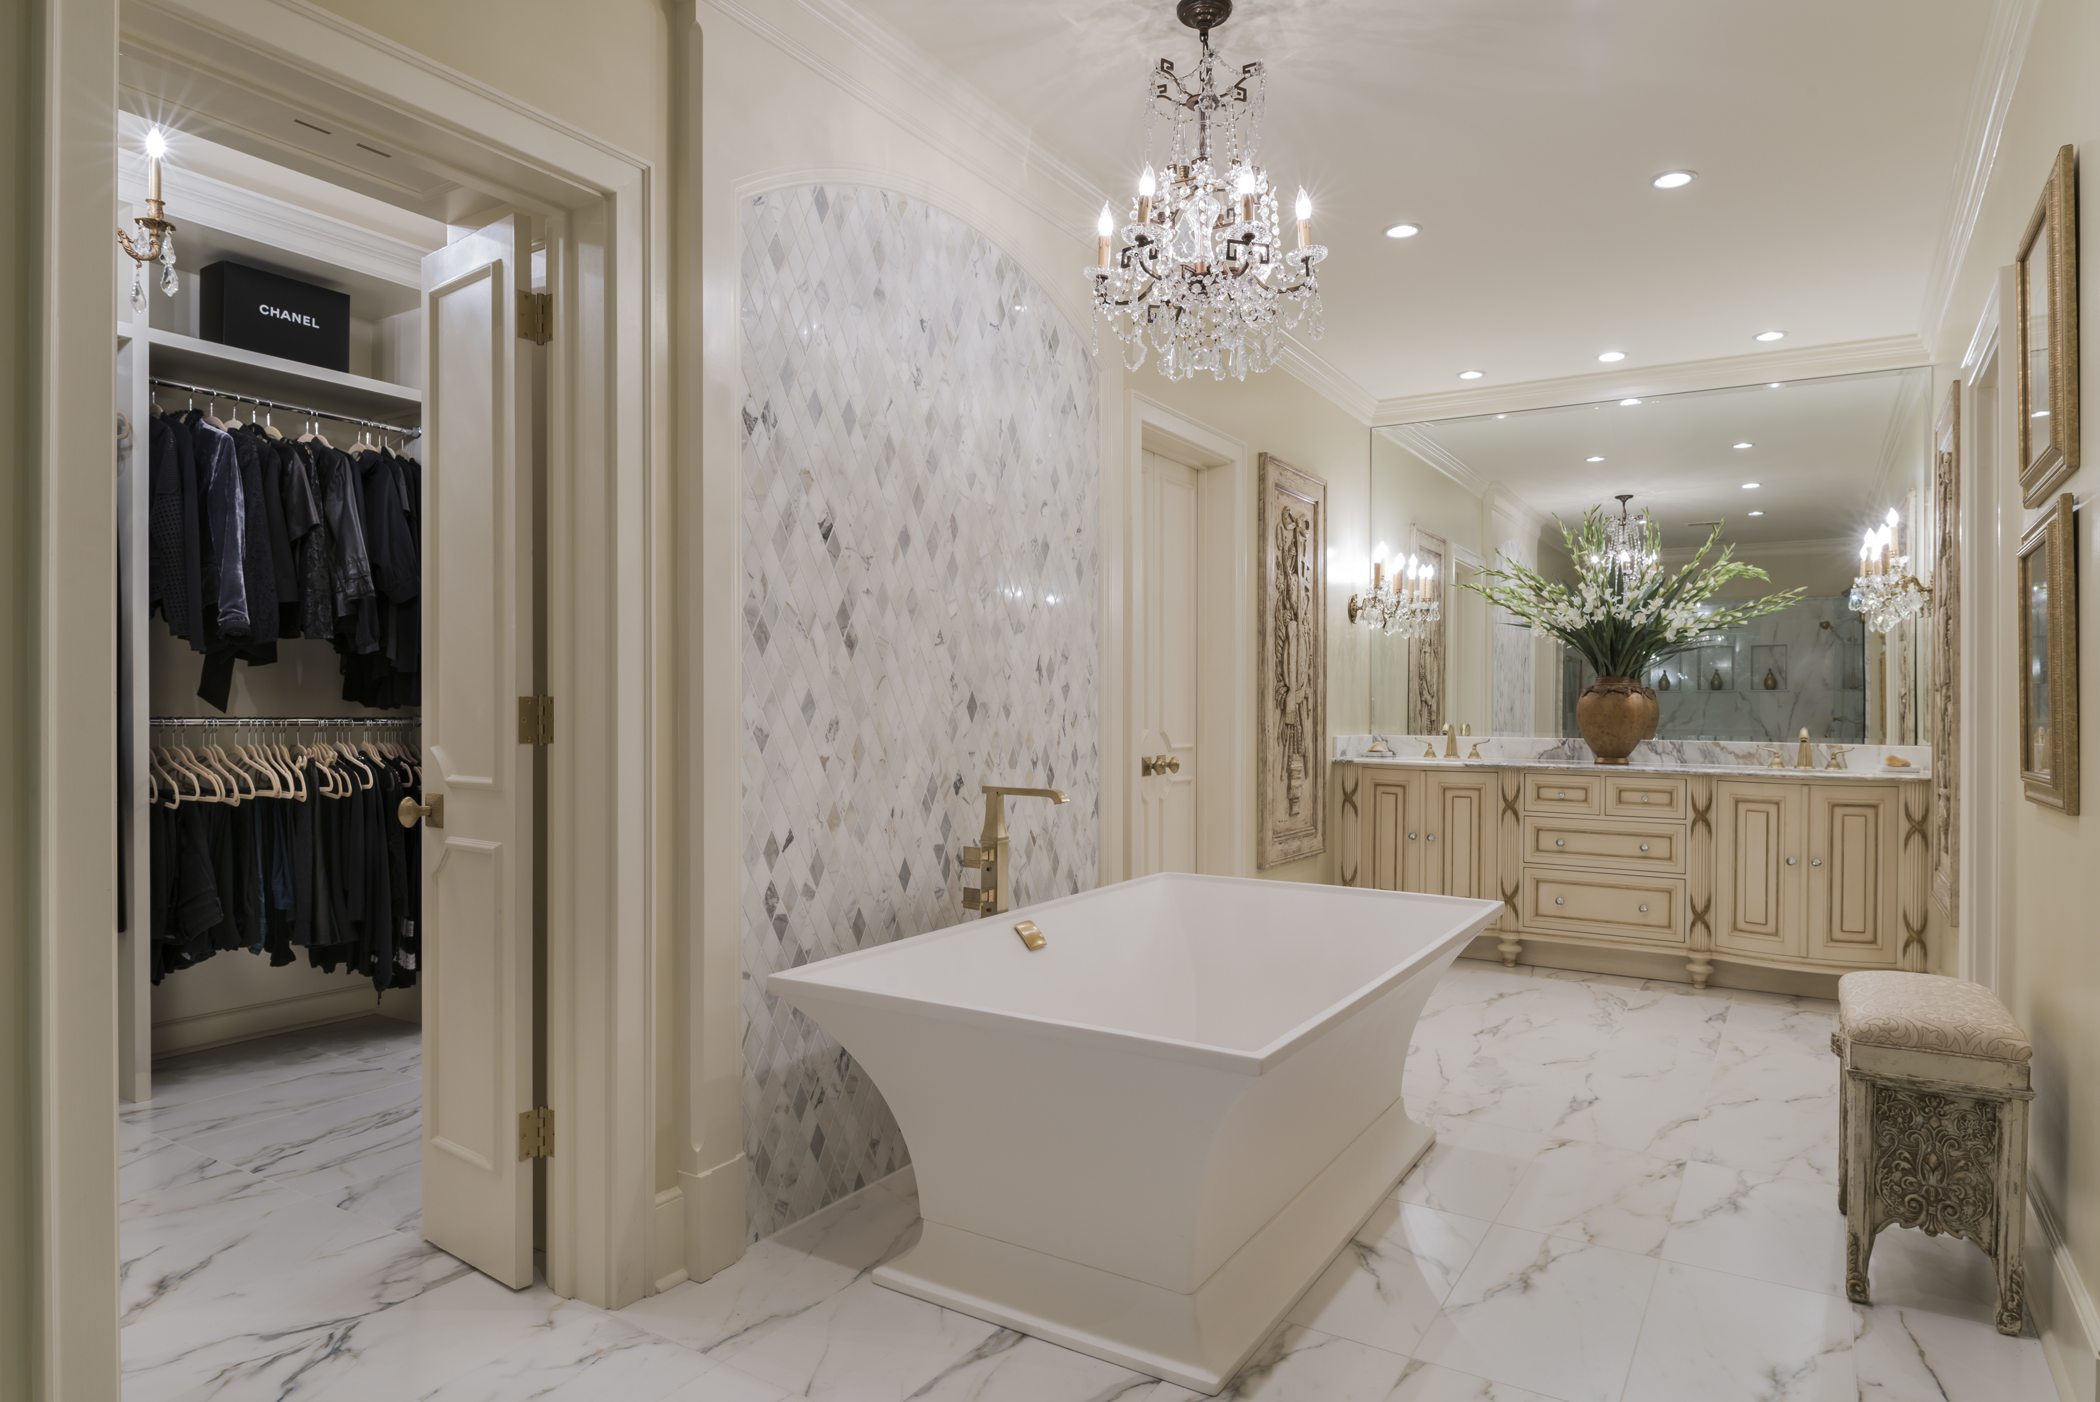 Memphis TN USA Renovating A Master Bath Into Cohesive Suite